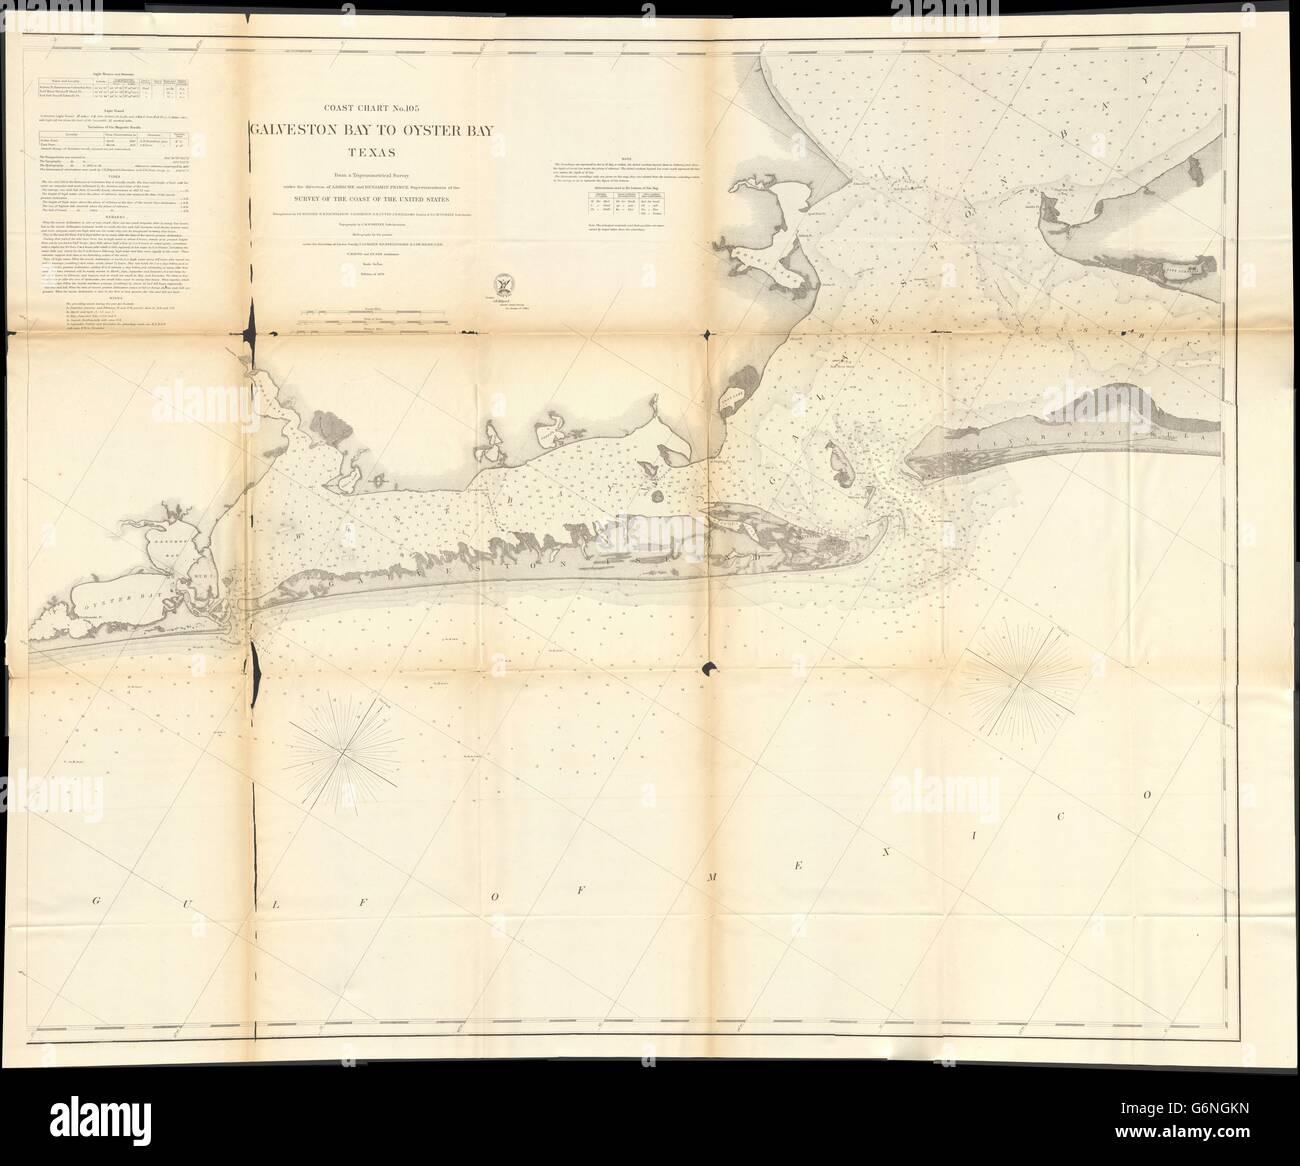 GALVESTON BAY: Texas coast chart. Houston. Texas City. USCGS, 1871 on